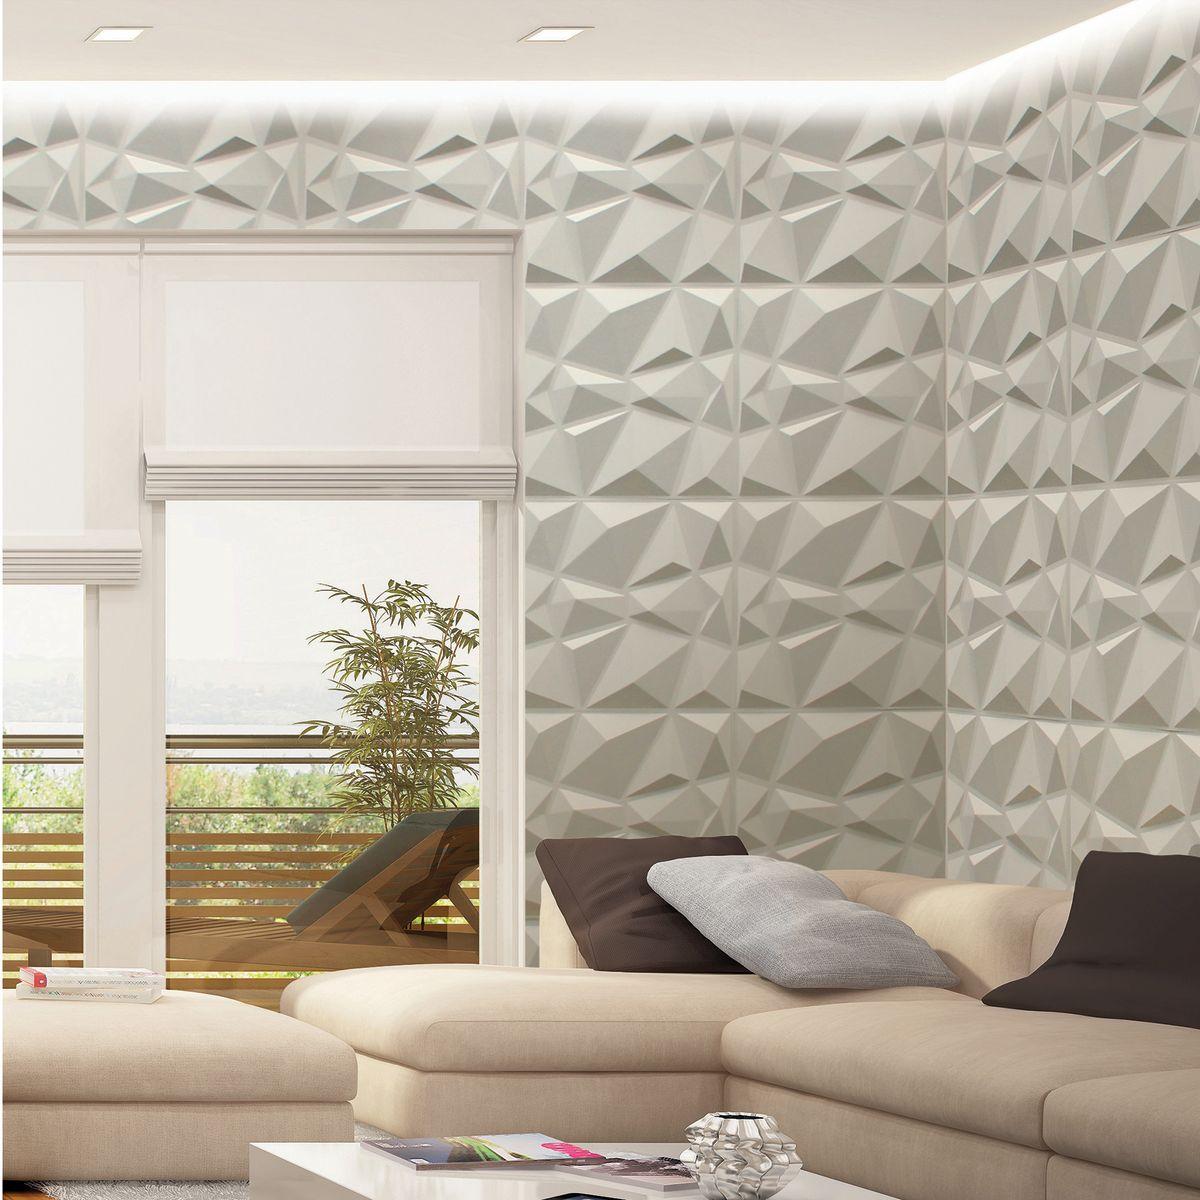 Rivestimento parete legno bianco ts36 regardsdefemmes for Rivestimento parete leroy merlin